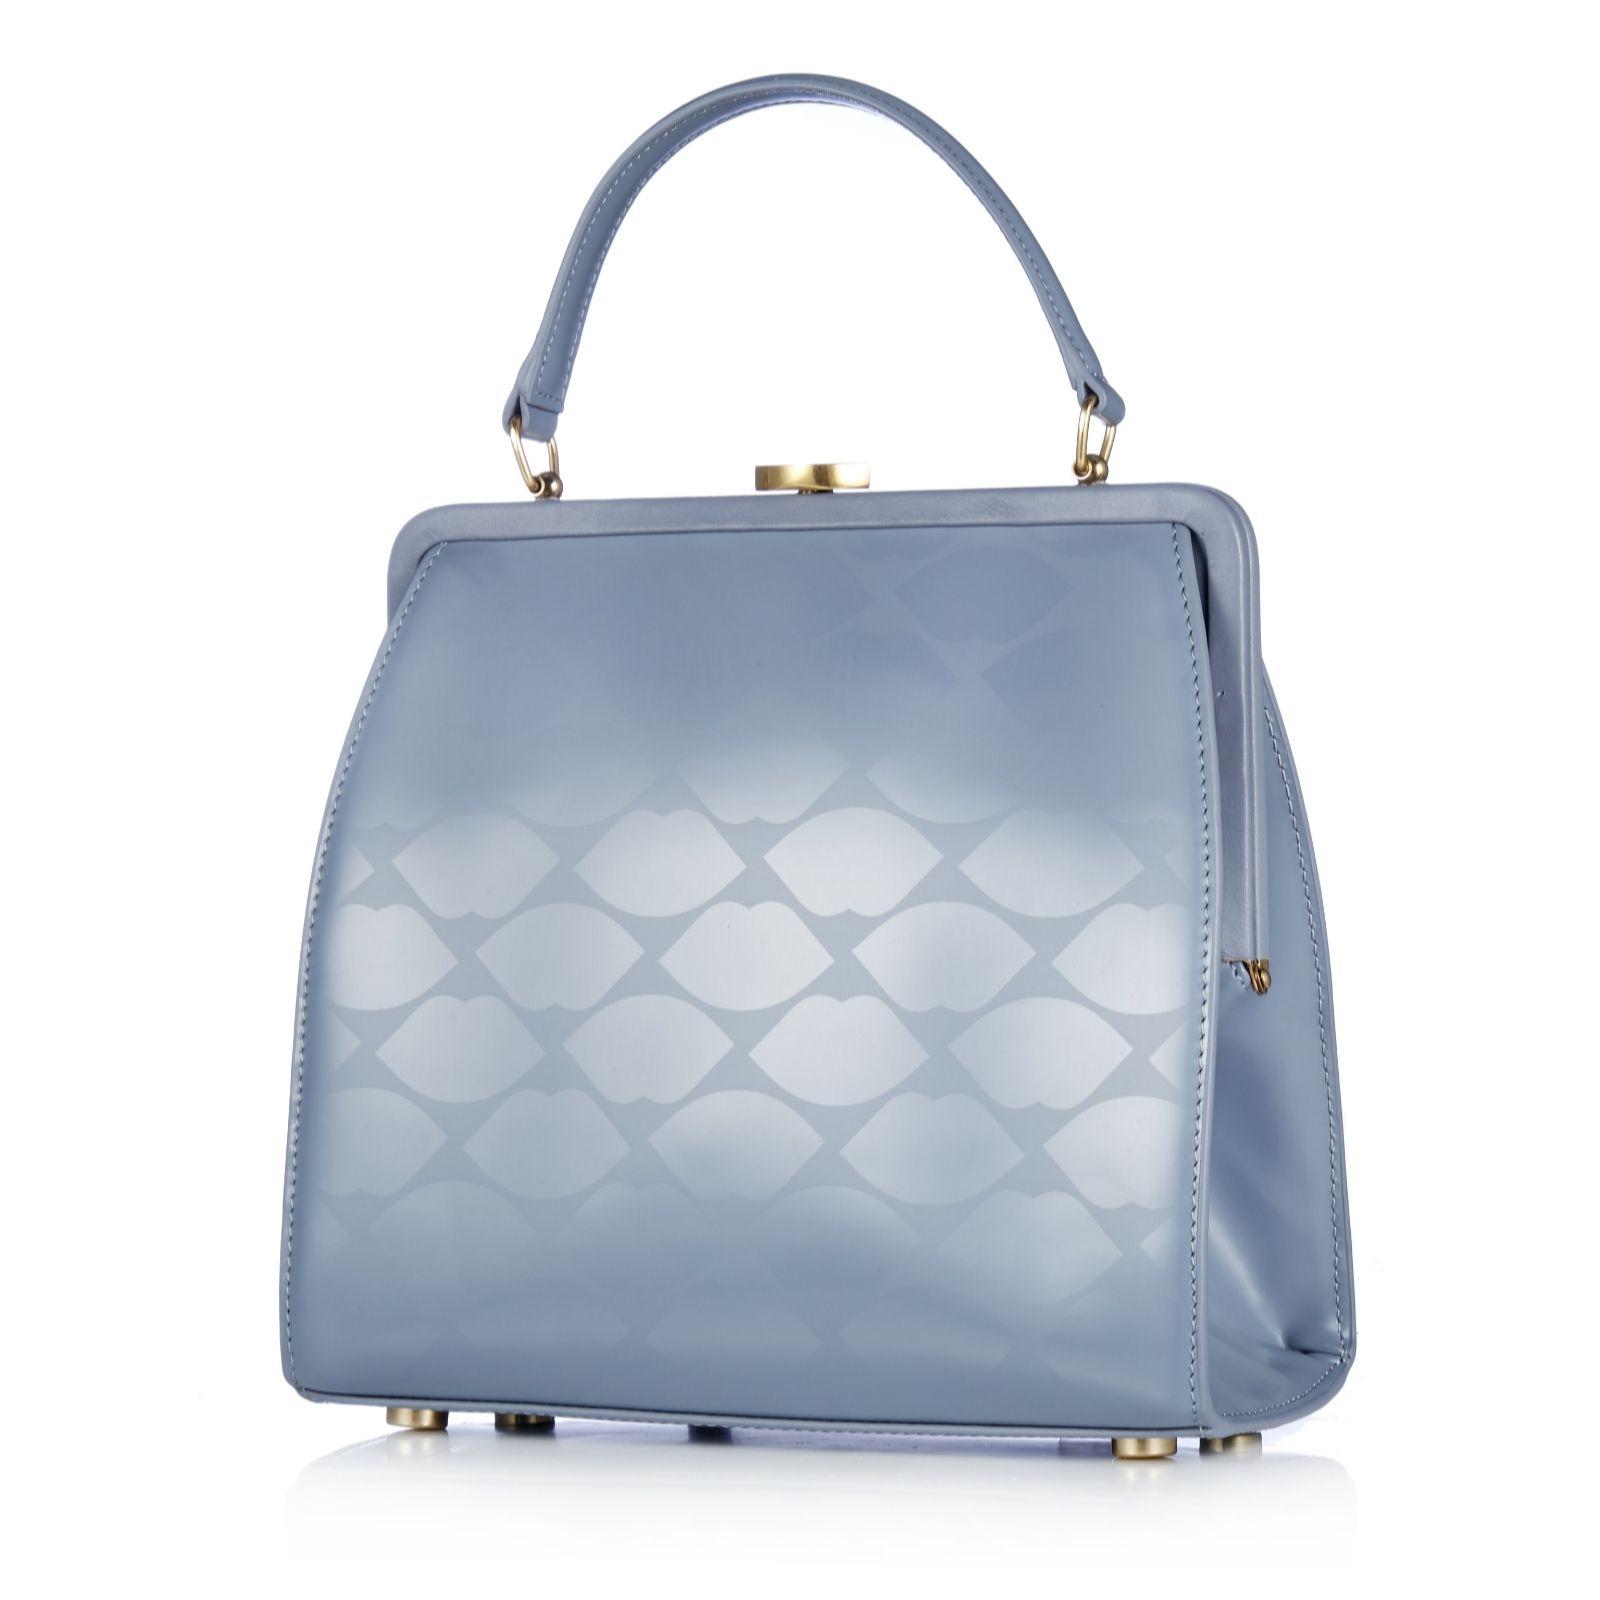 Silver leather tote bag uk - Lulu Guinness Lip Print Leather Eva Handbag 158912